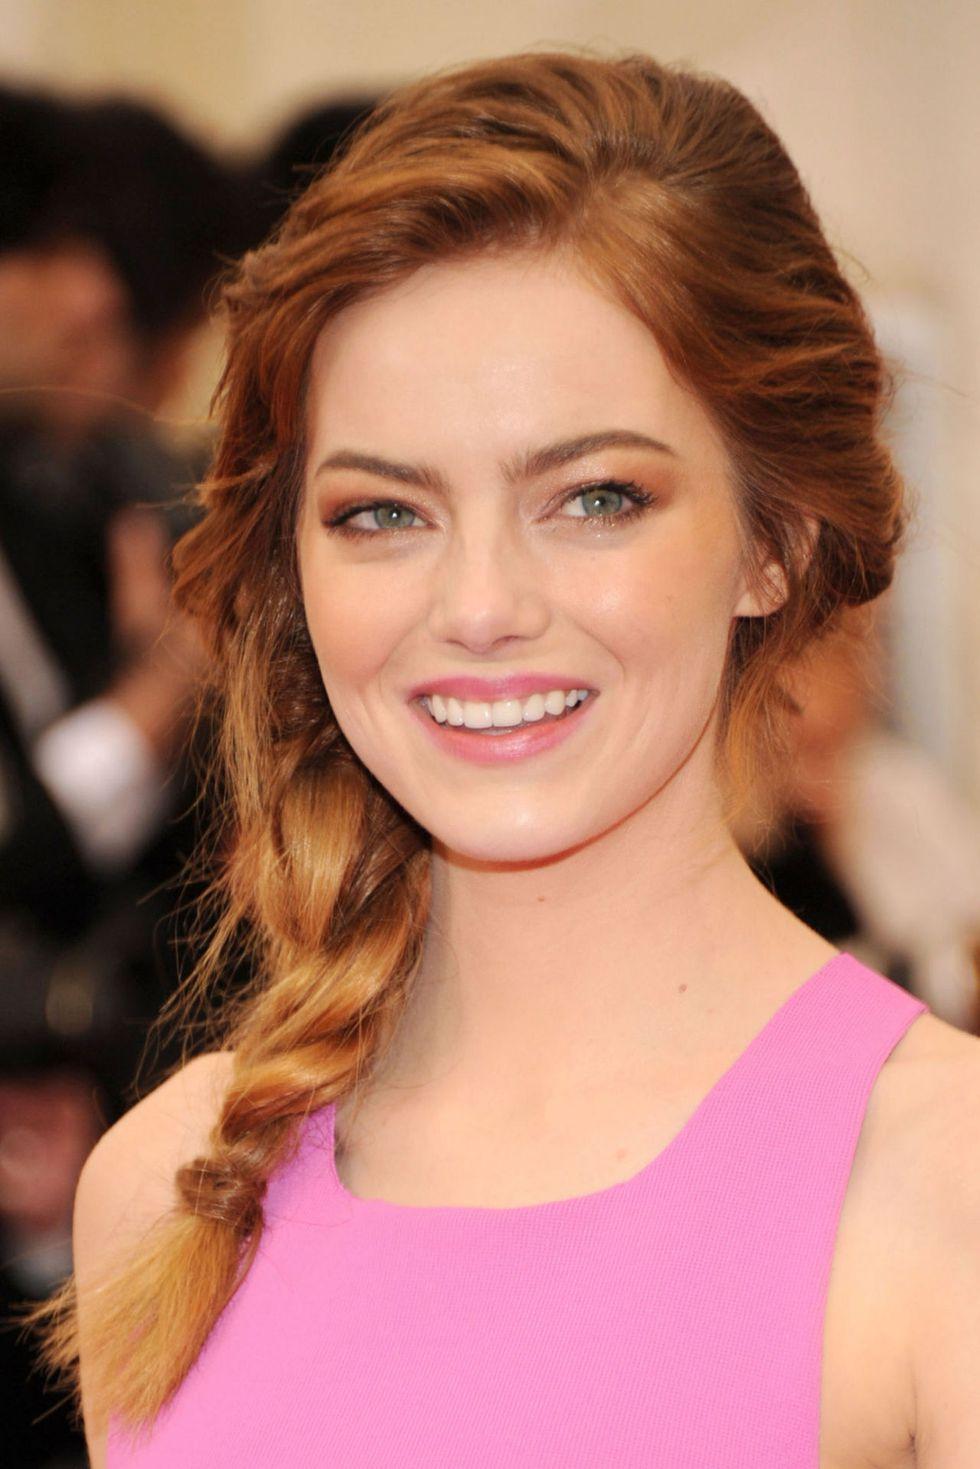 wedding-guest-hair-side-braid-updo-style-beauty-emmastone-red-hair-pink-dress.jpg